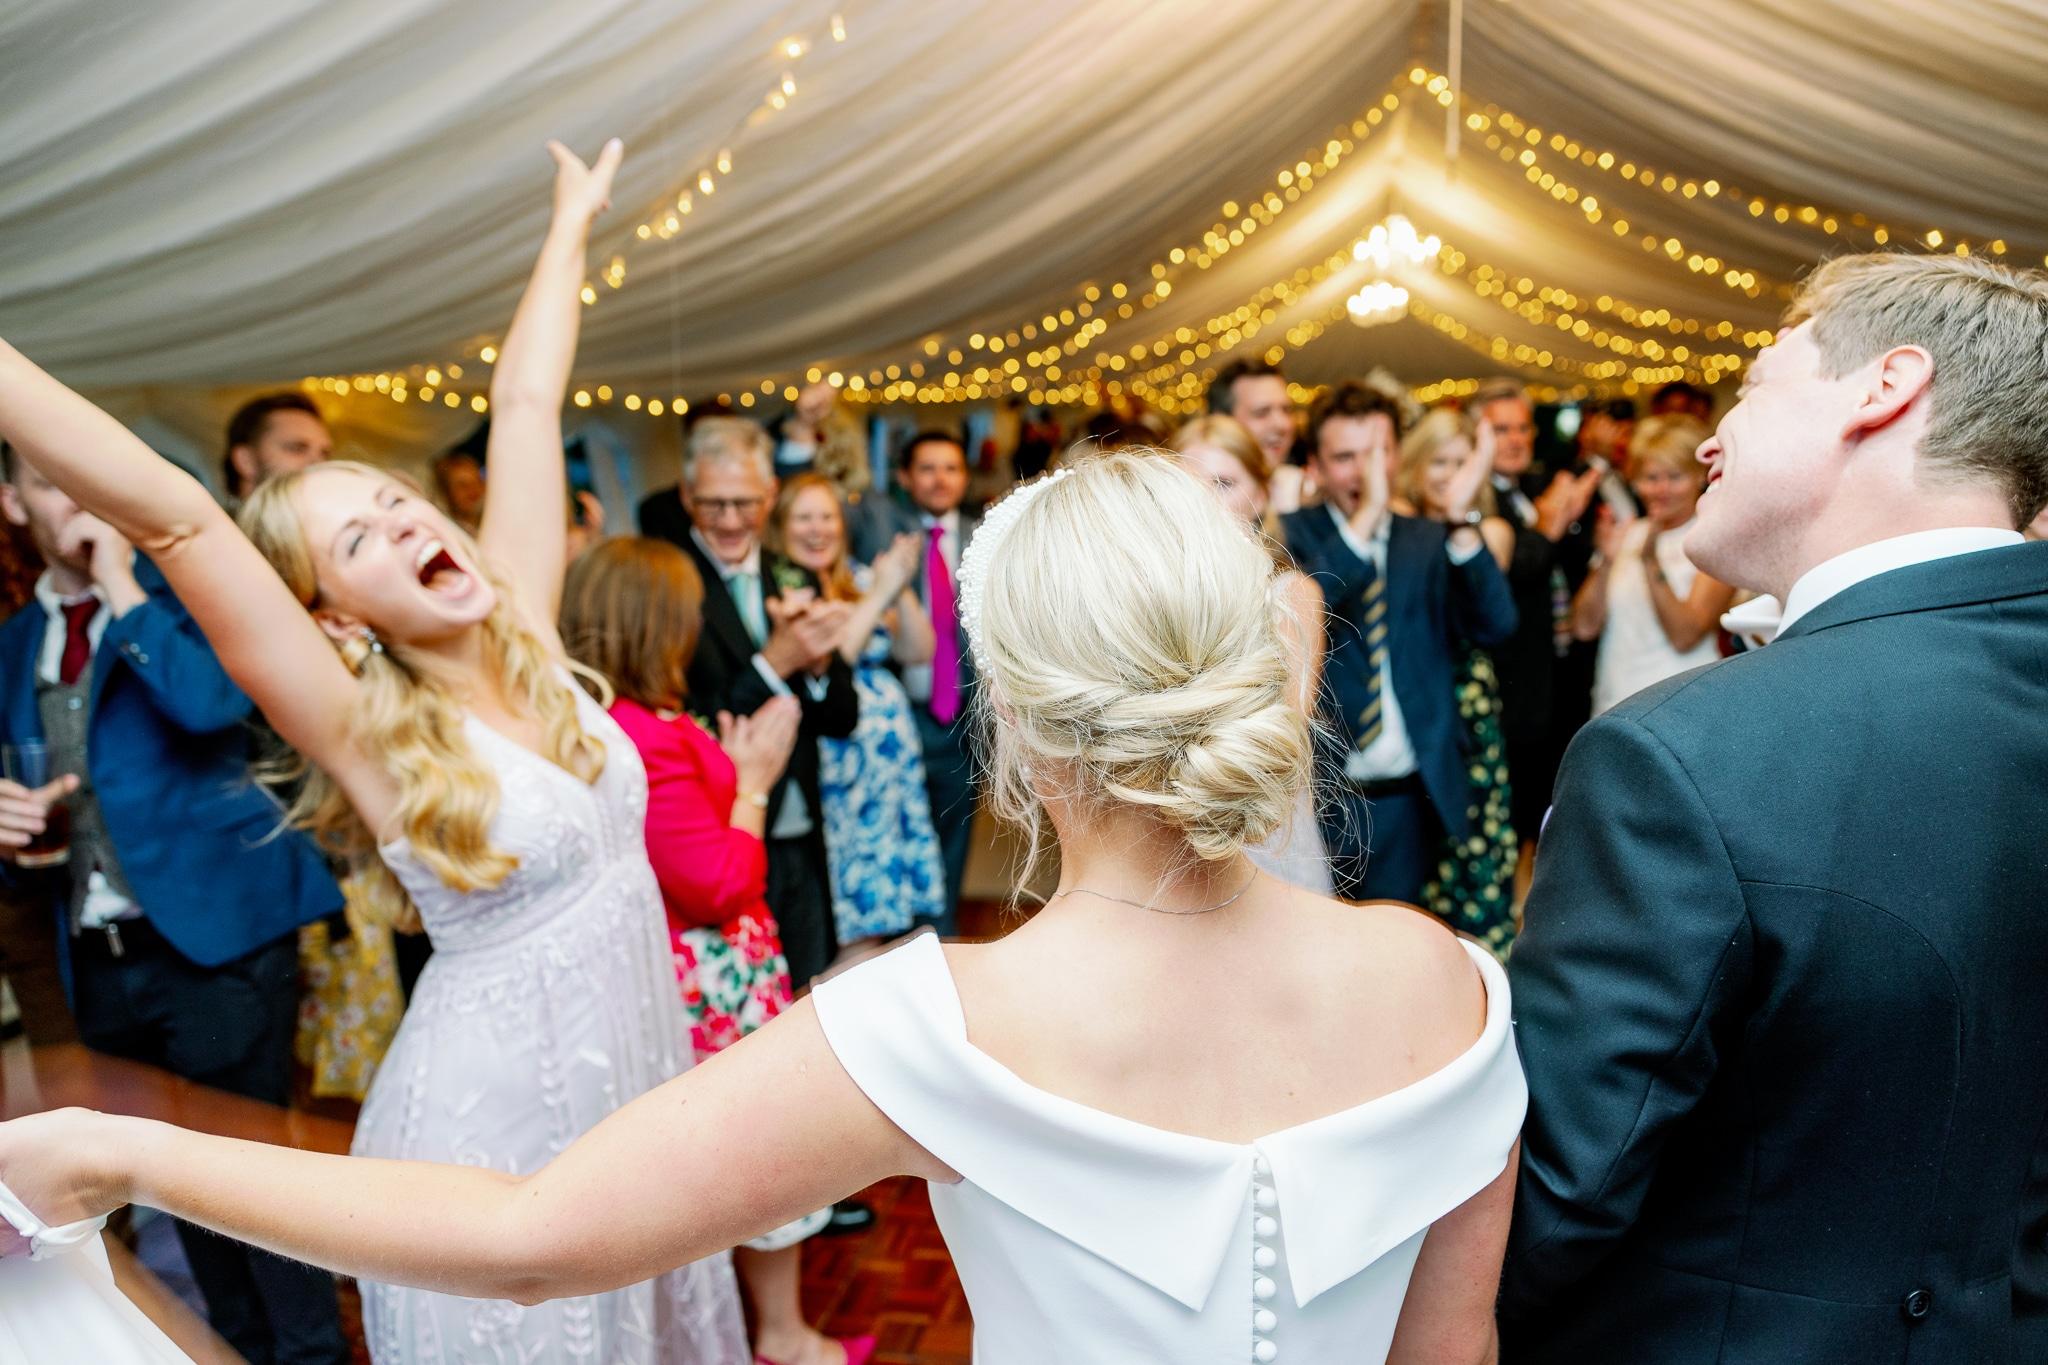 Dancing in East Sussex Marquee wedding venue Brickwall House